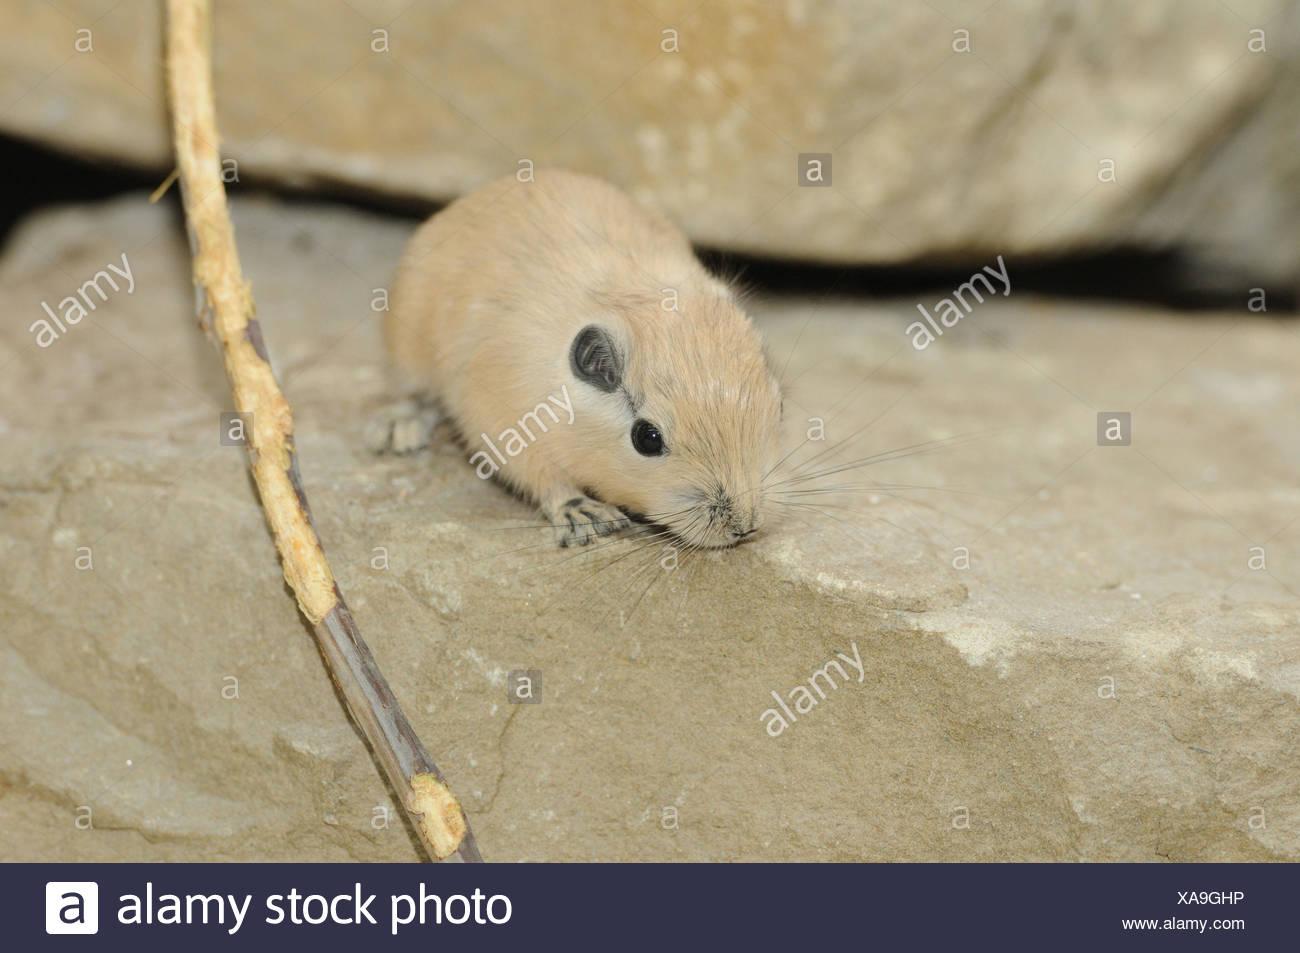 Common Gundi, Ctenodactylus gundi, young animal, rock, front view, sitting, looking at camera, - Stock Image